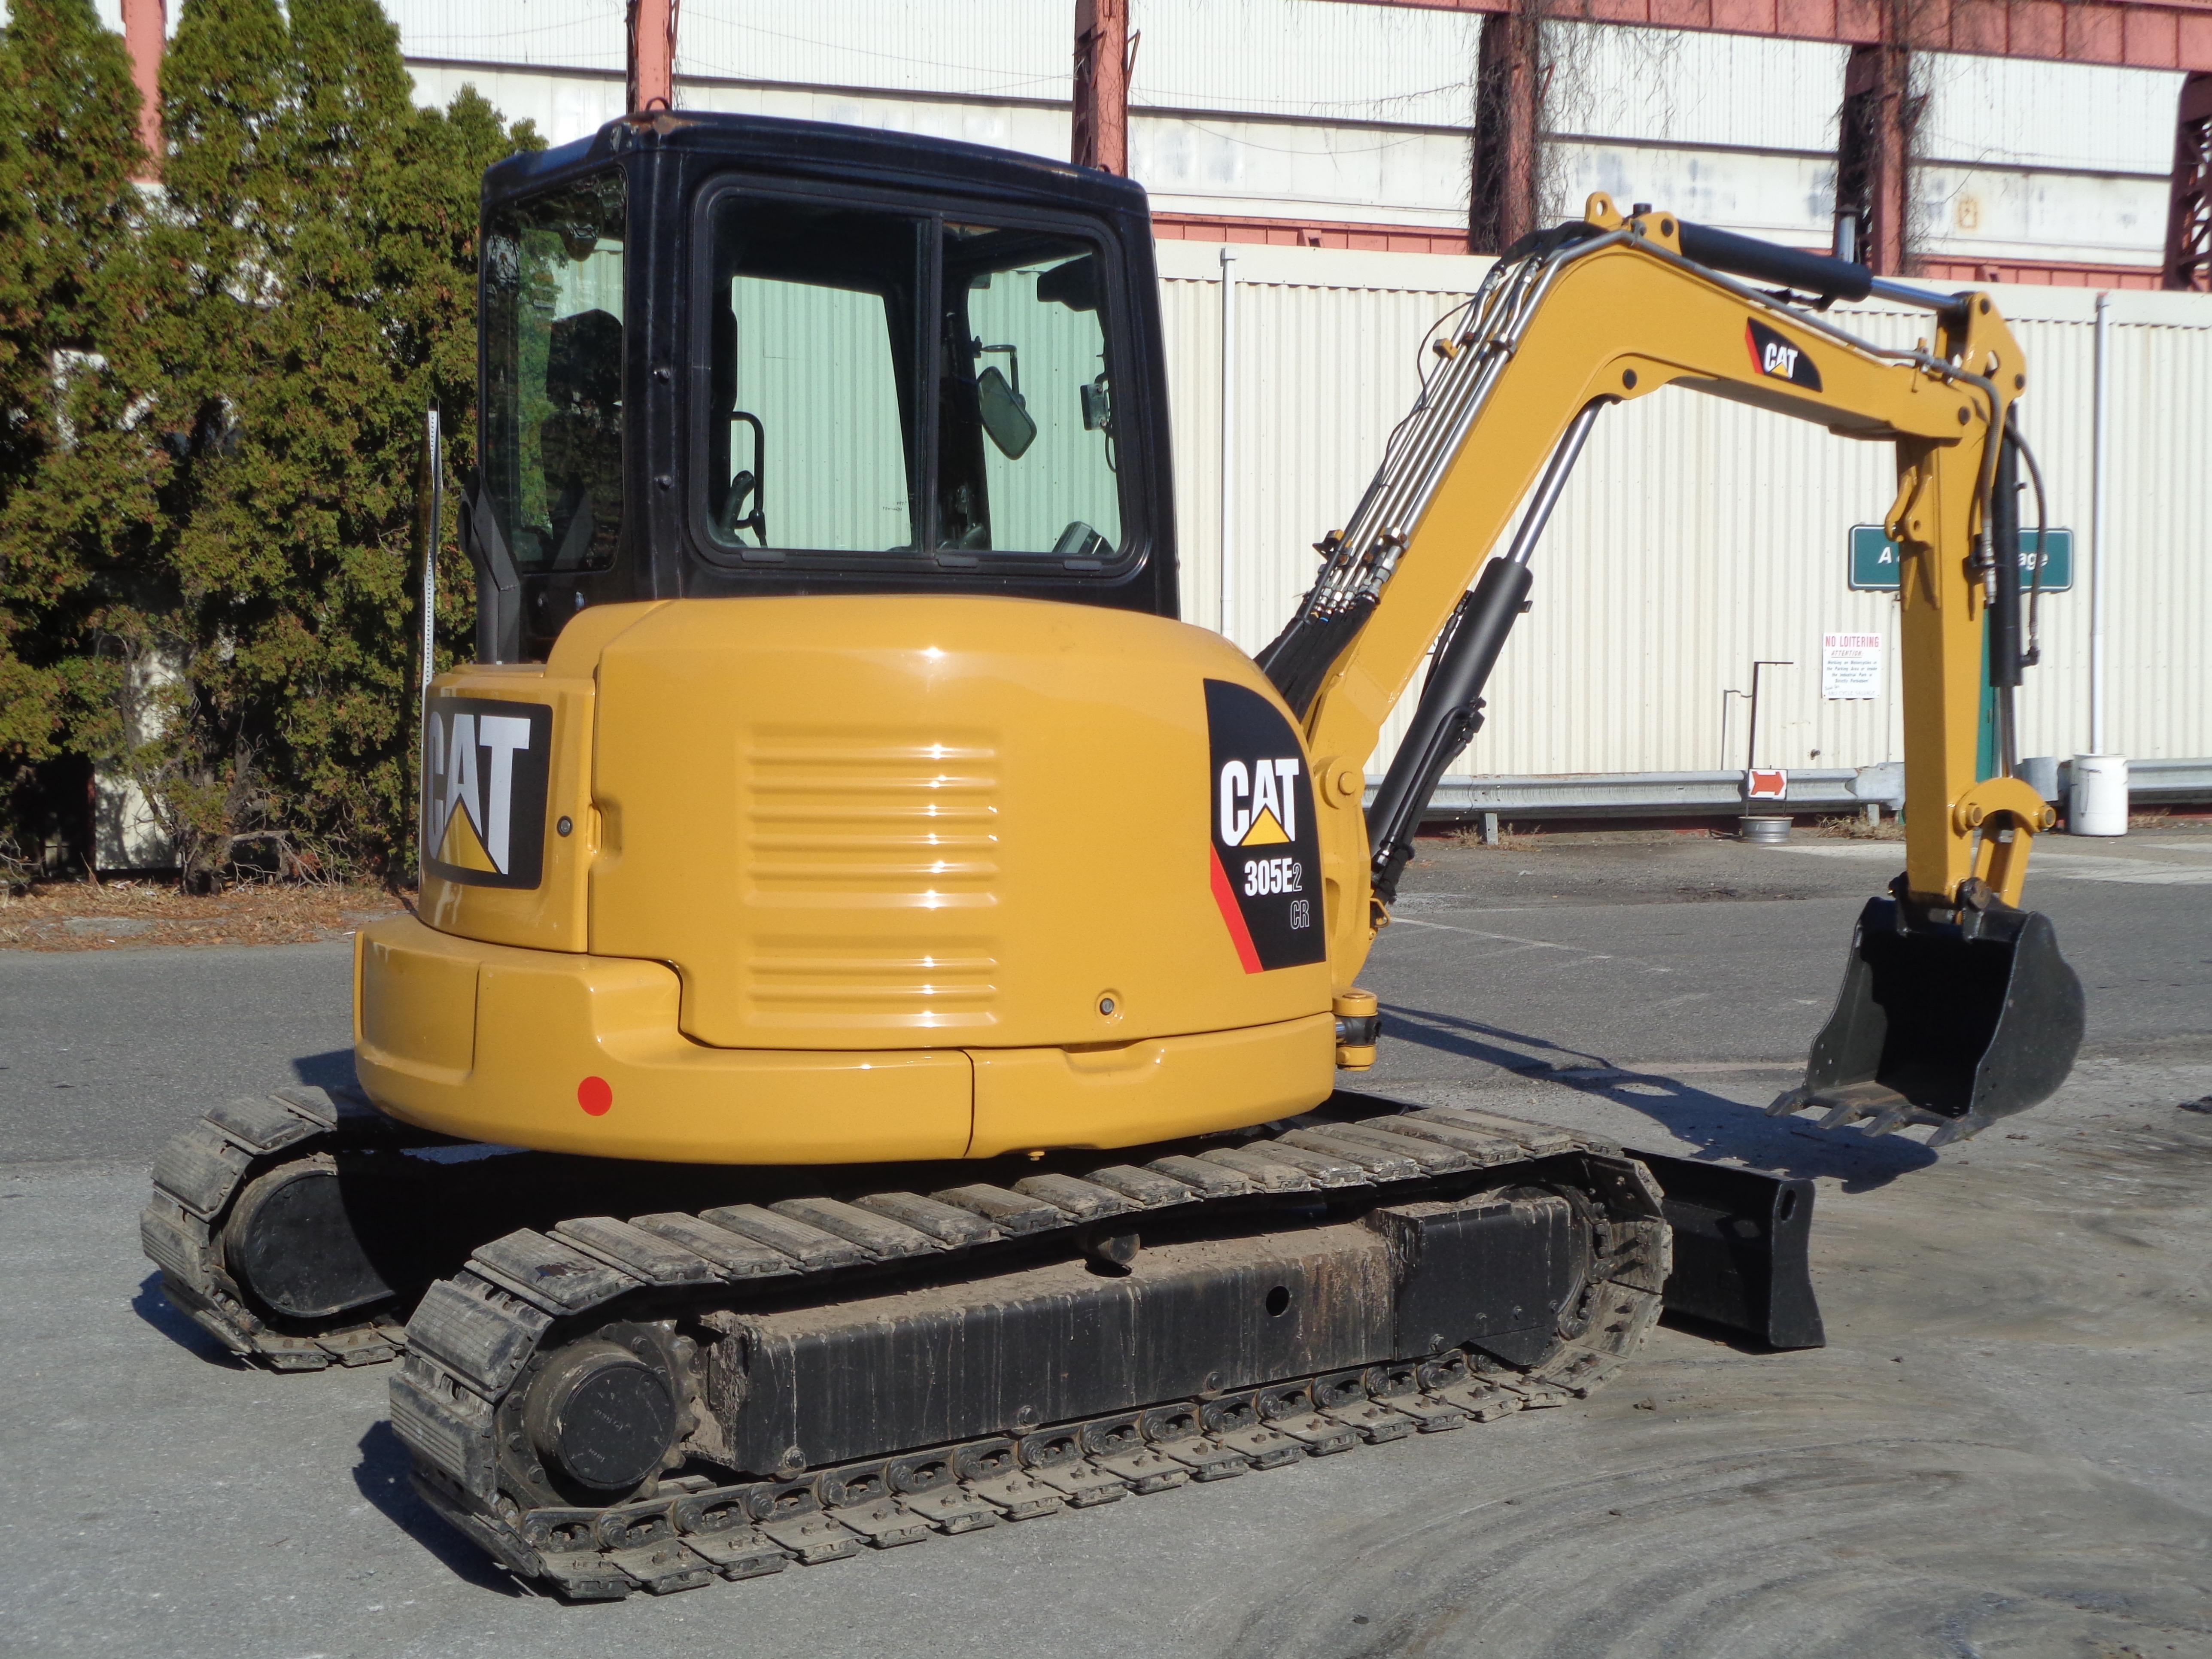 Lot 33 - 2016 Caterpillar 305E2 CR Mini Hydraulic Excavator